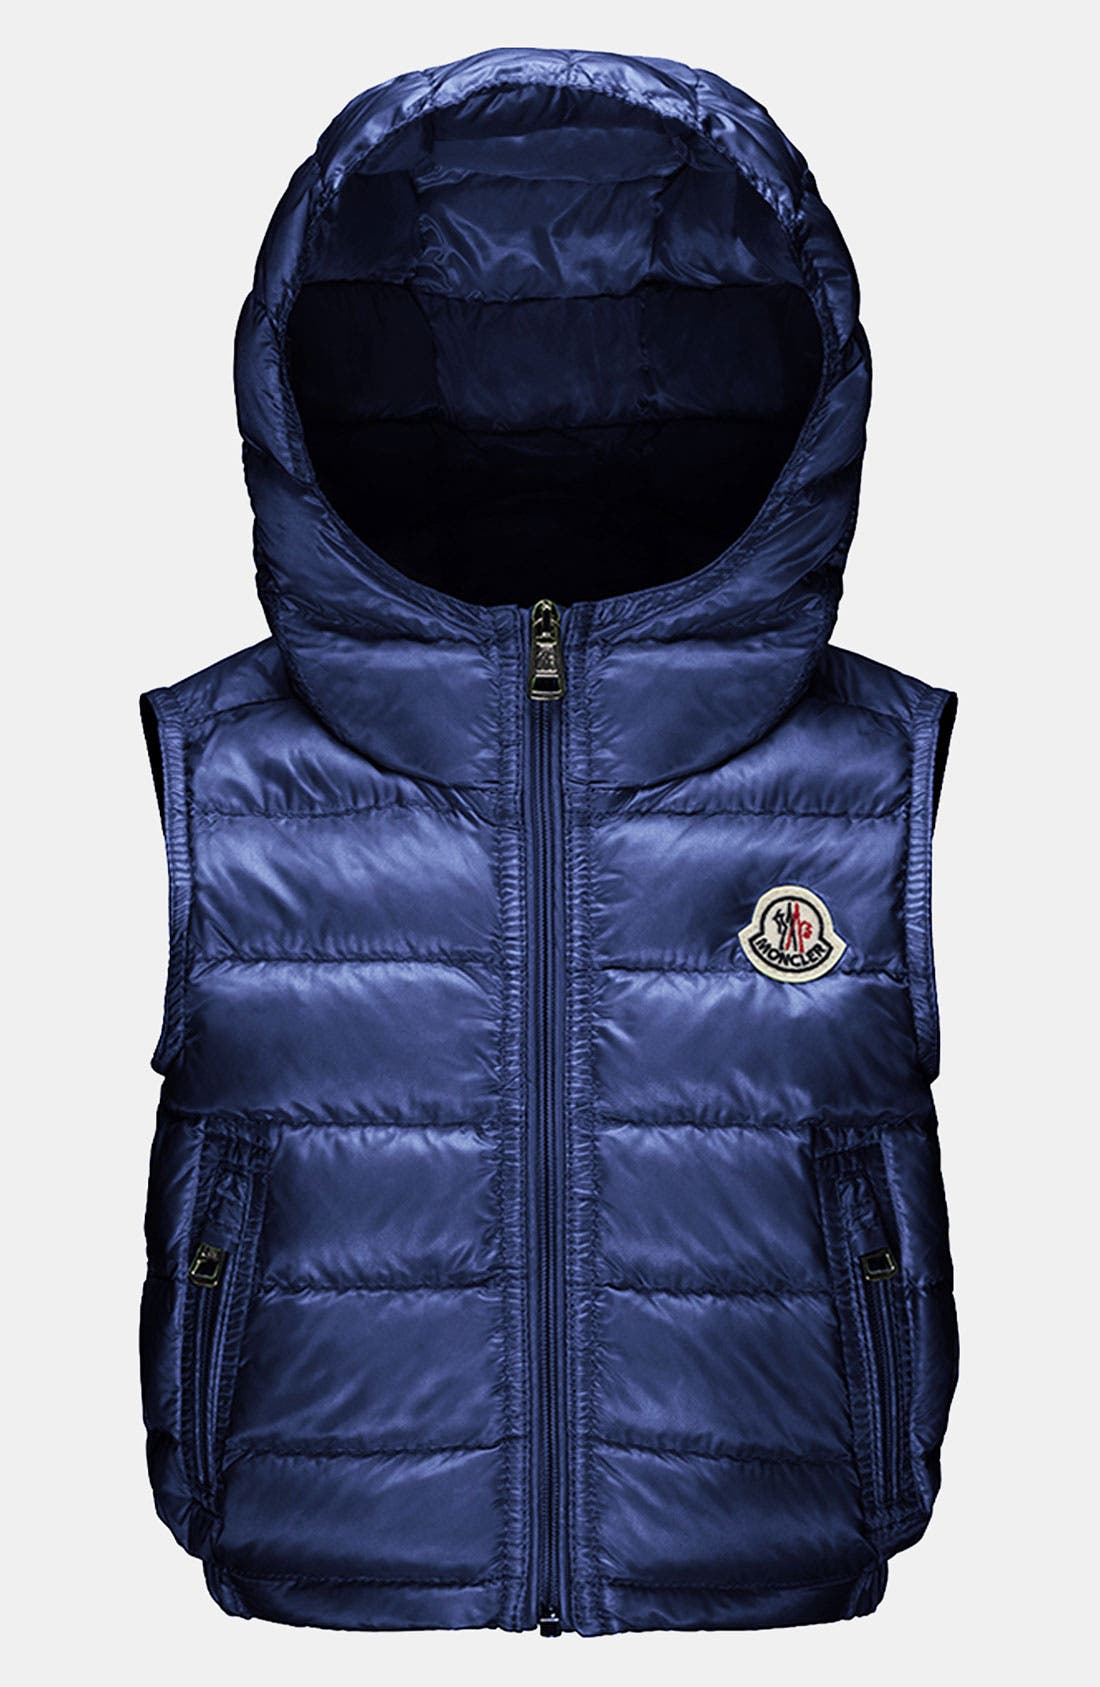 Alternate Image 1 Selected - Moncler 'Patrick' Hooded Vest (Baby)